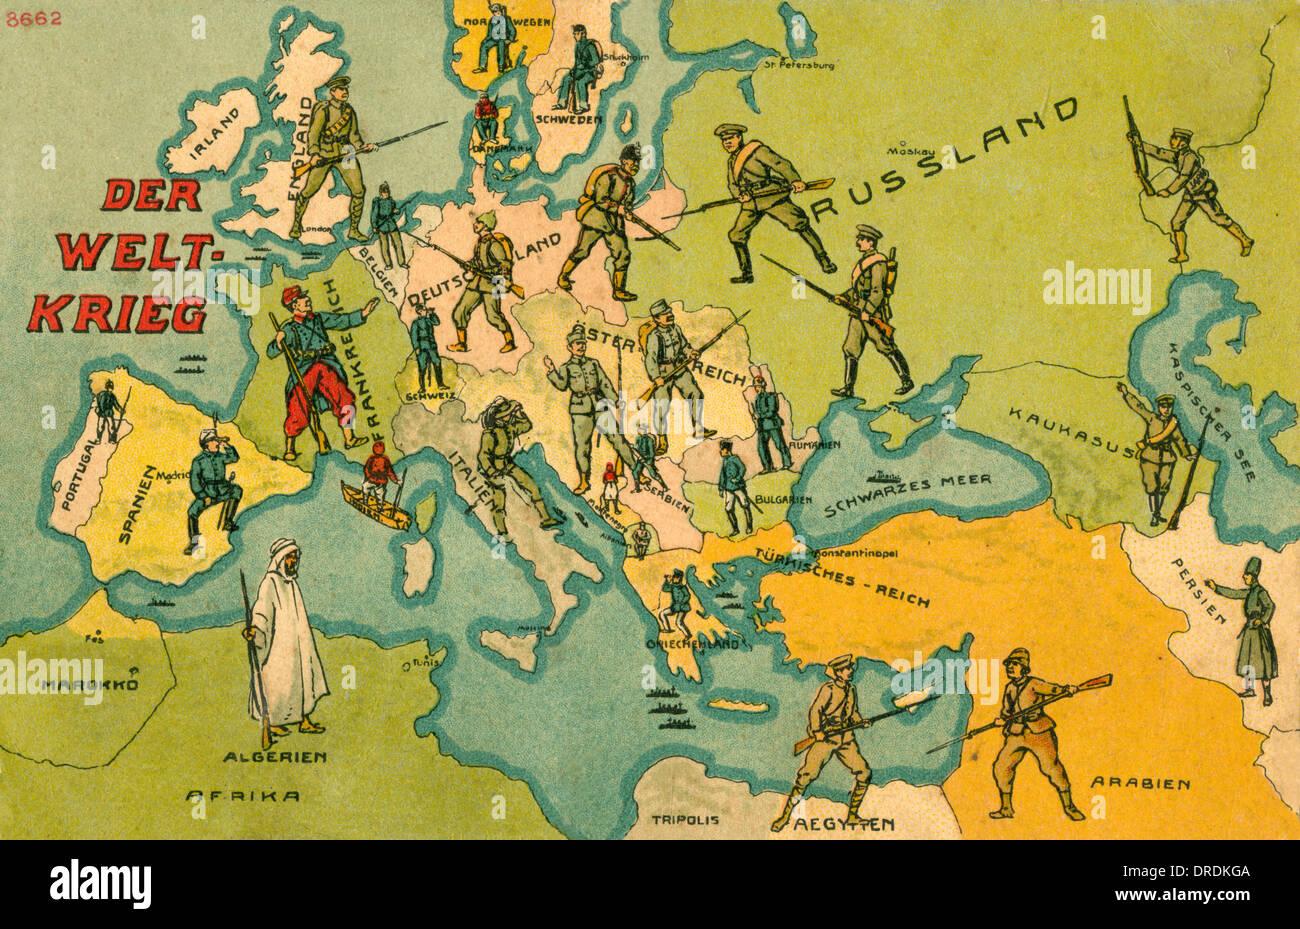 World War Map Stockfotos & World War Map Bilder - Alamy